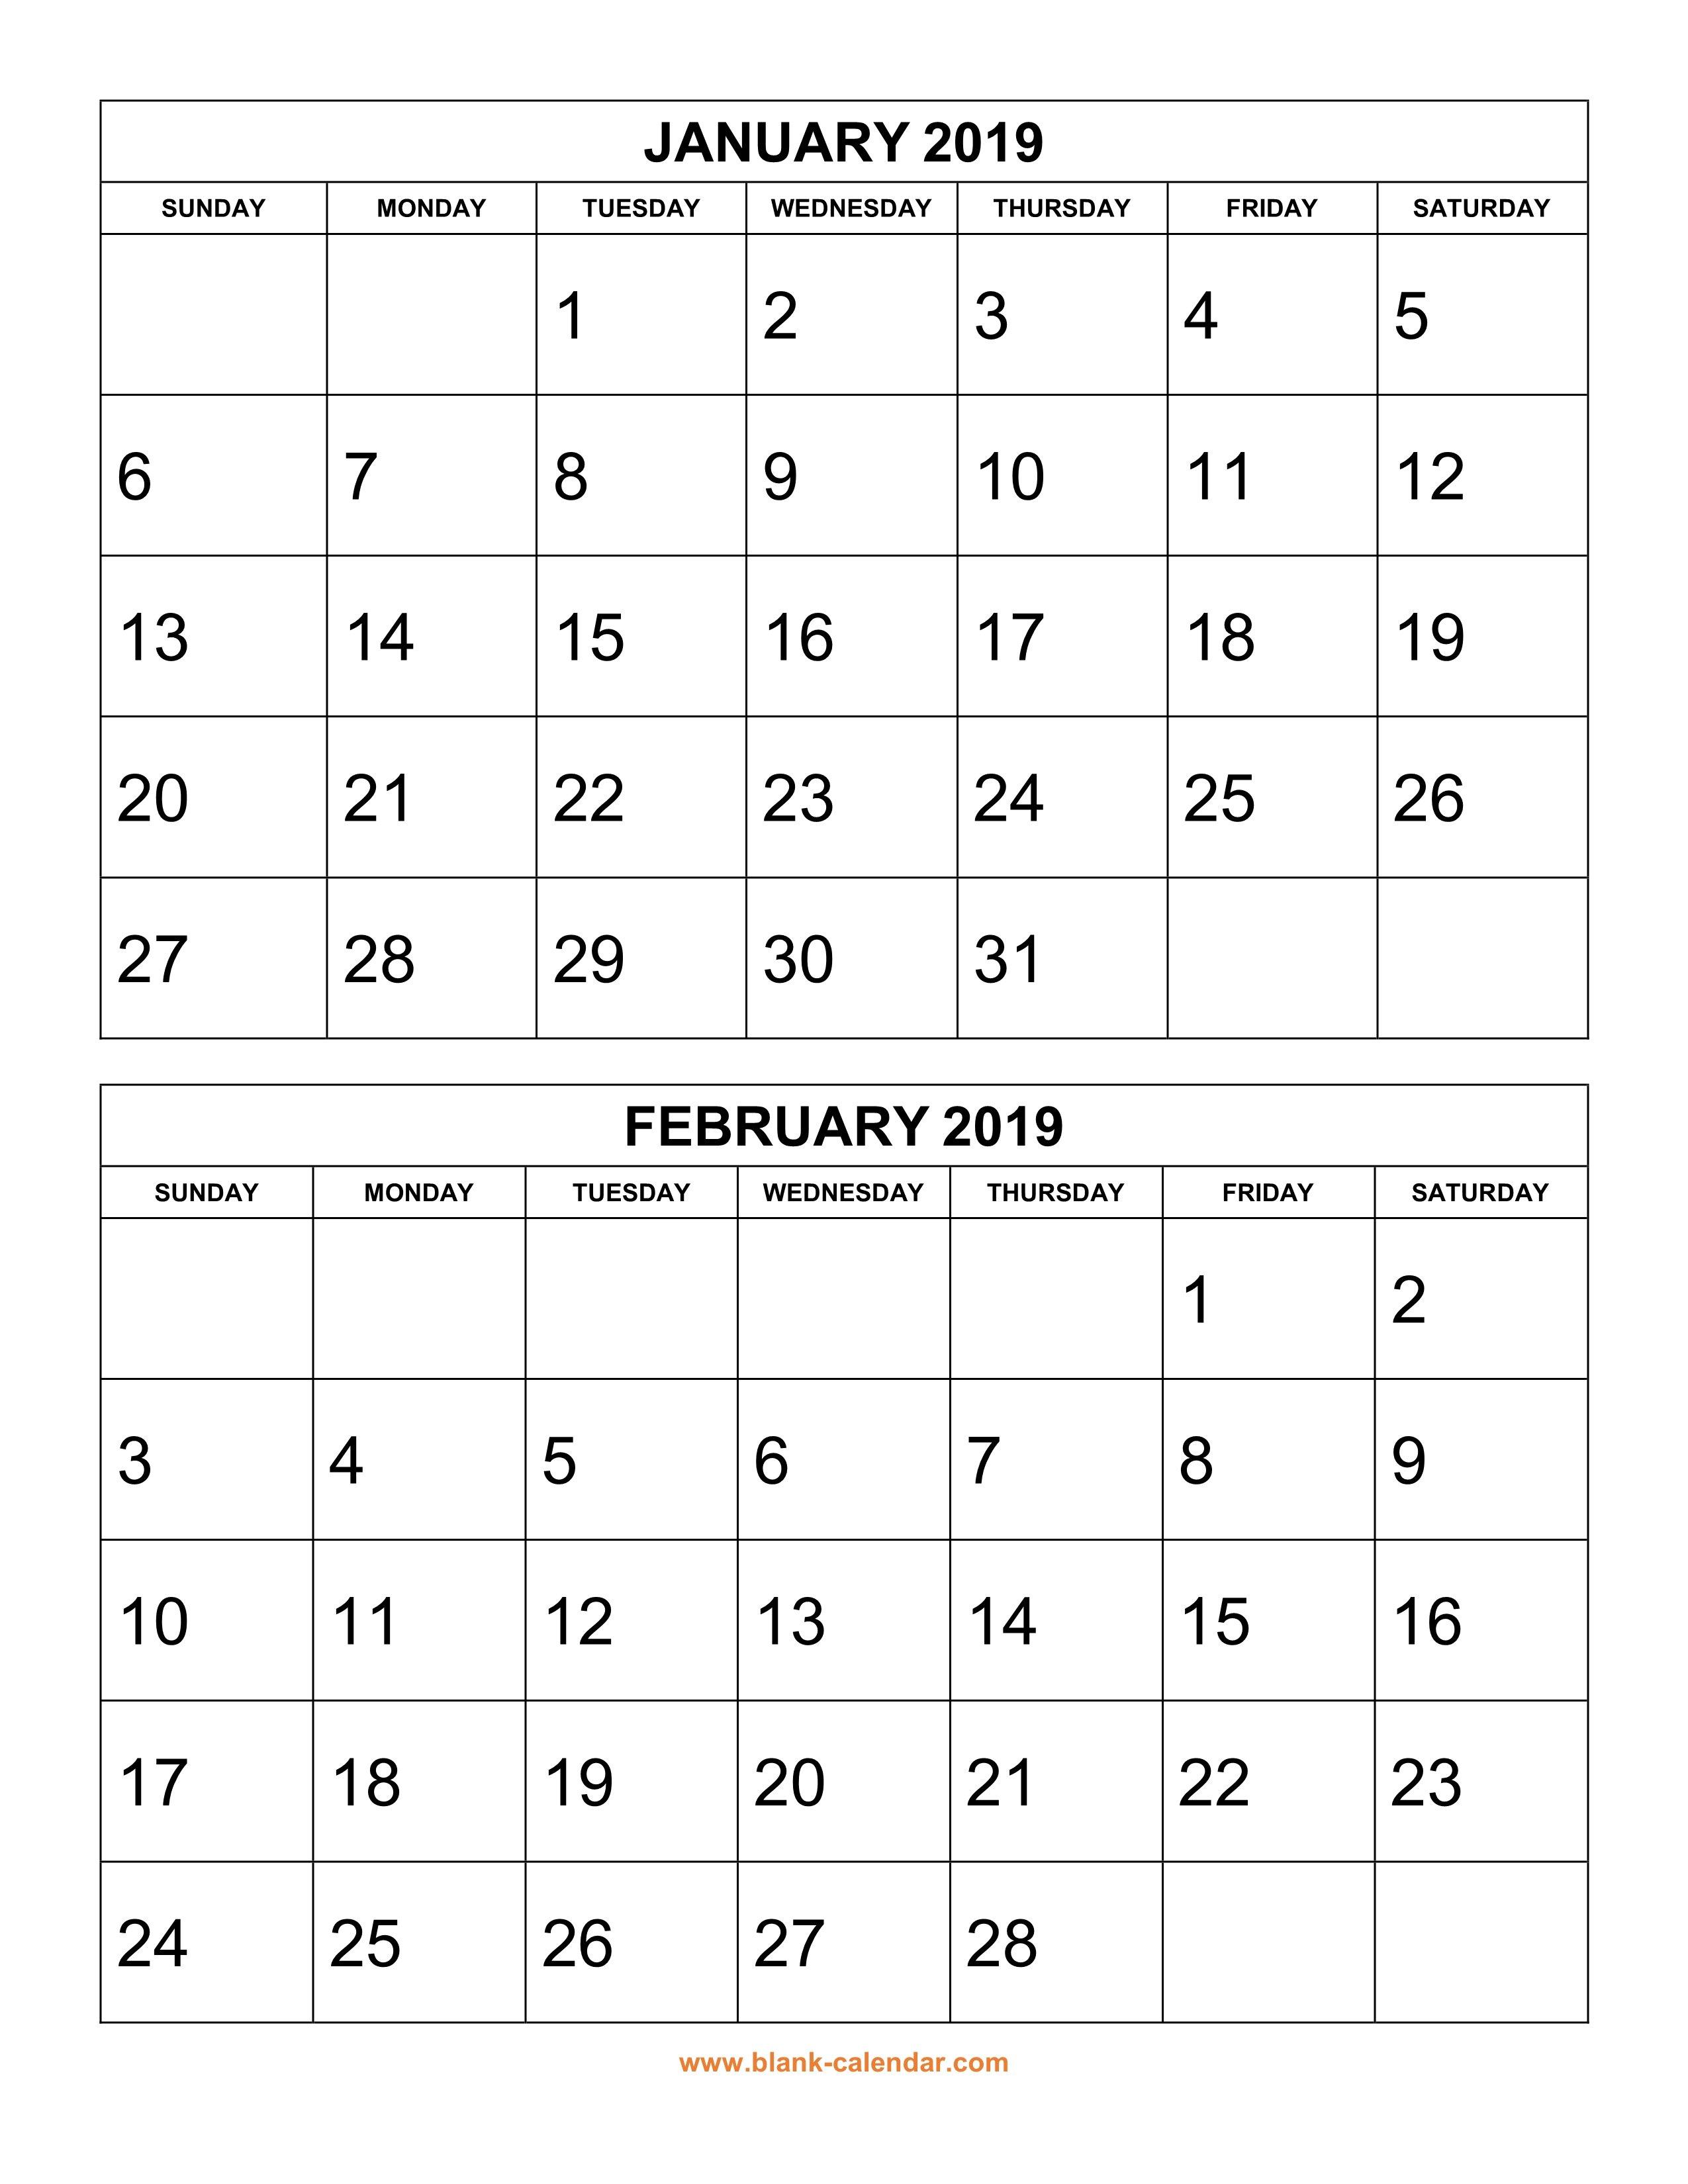 Free Download Printable Calendar 2019, 2 Months Per Page, 6 Pages Calendar 2019 2 Months Per Page